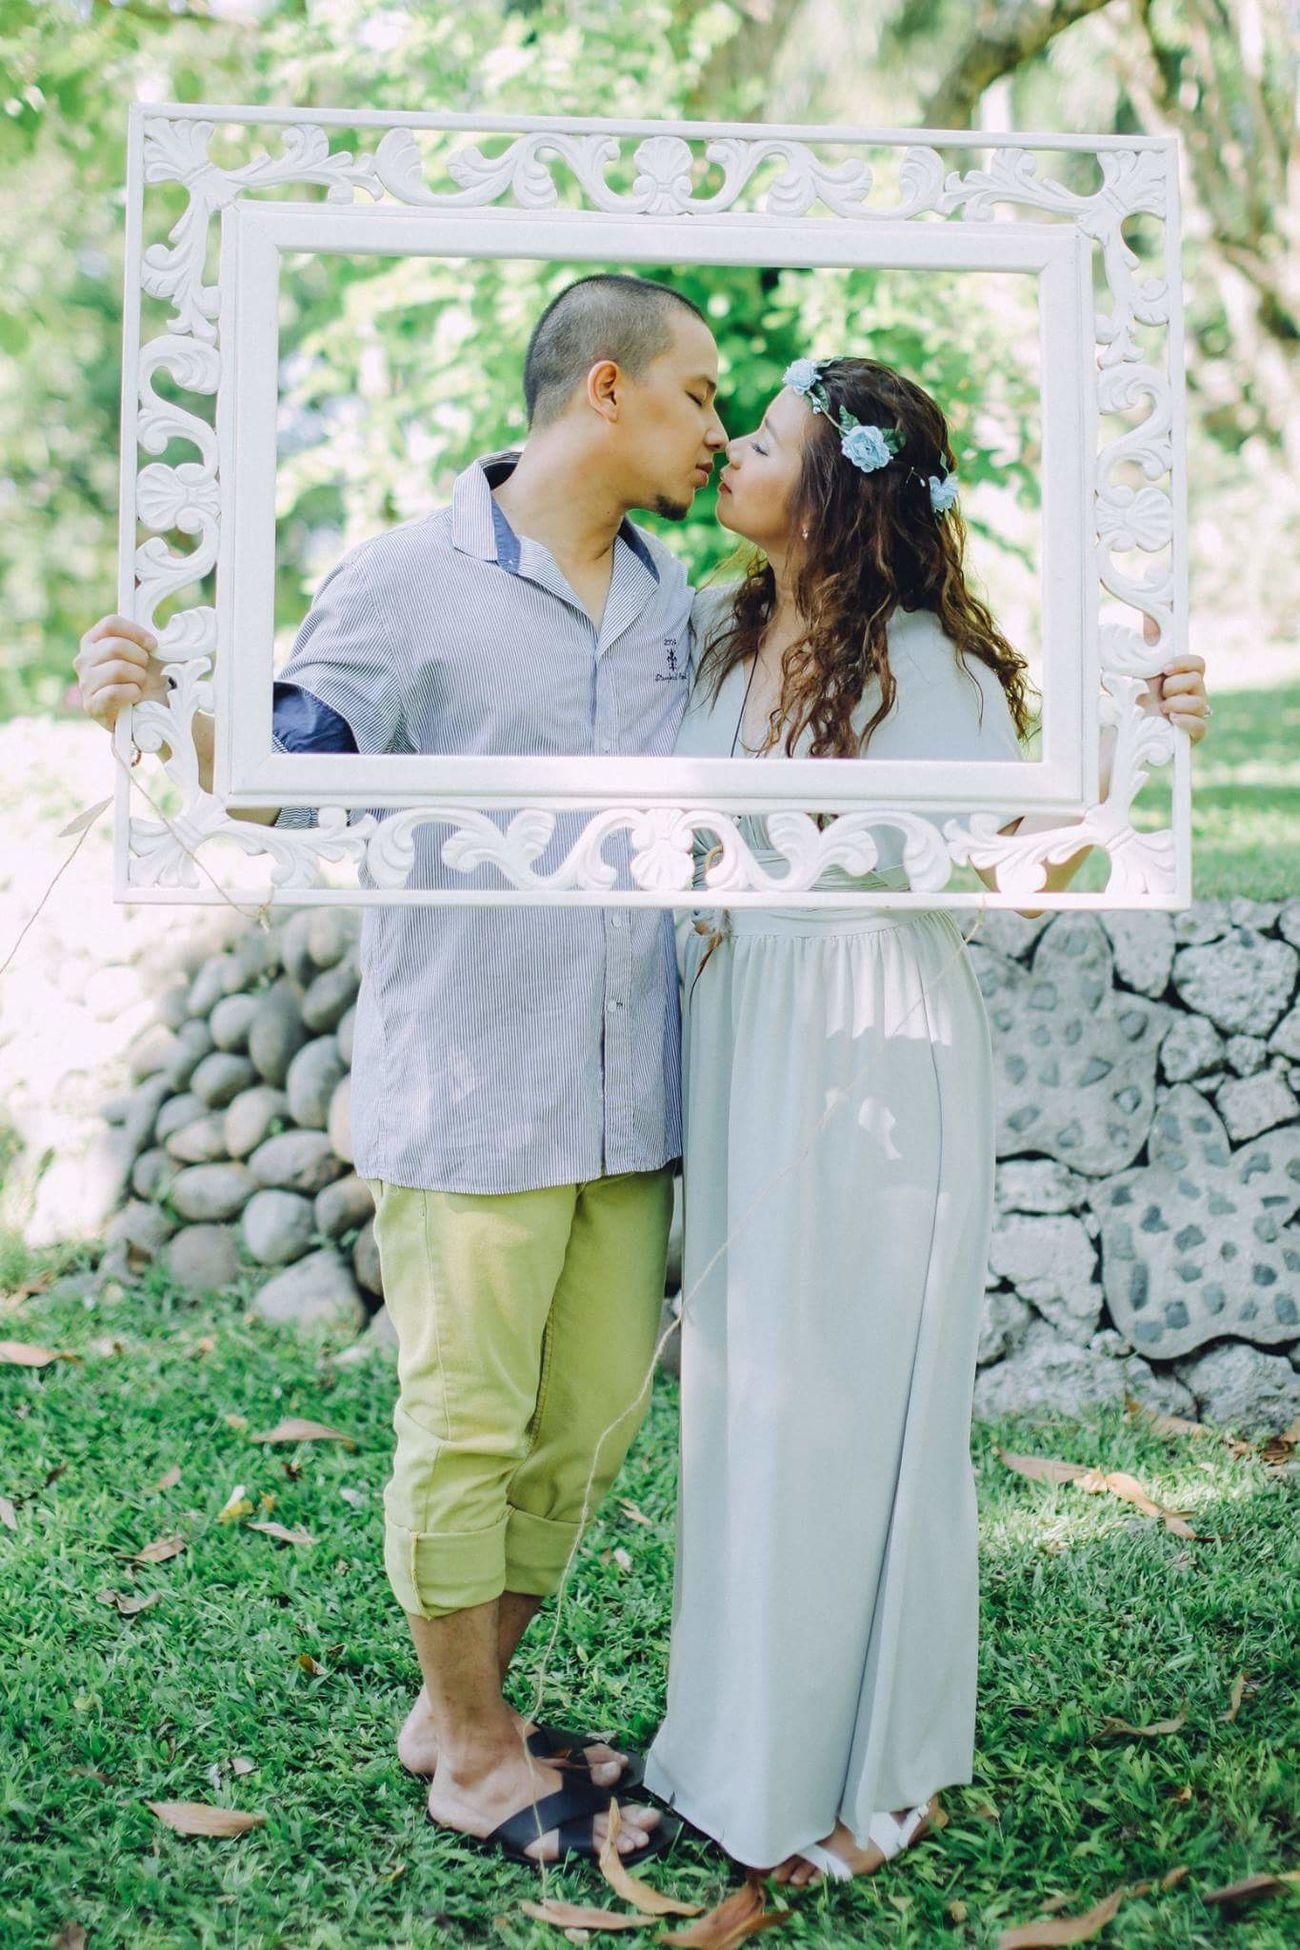 Two People Love Togetherness Romance People Bonding Outdoors Wedding Dress Well-dressed Bride Prenup Prenupshoot Groom Couple